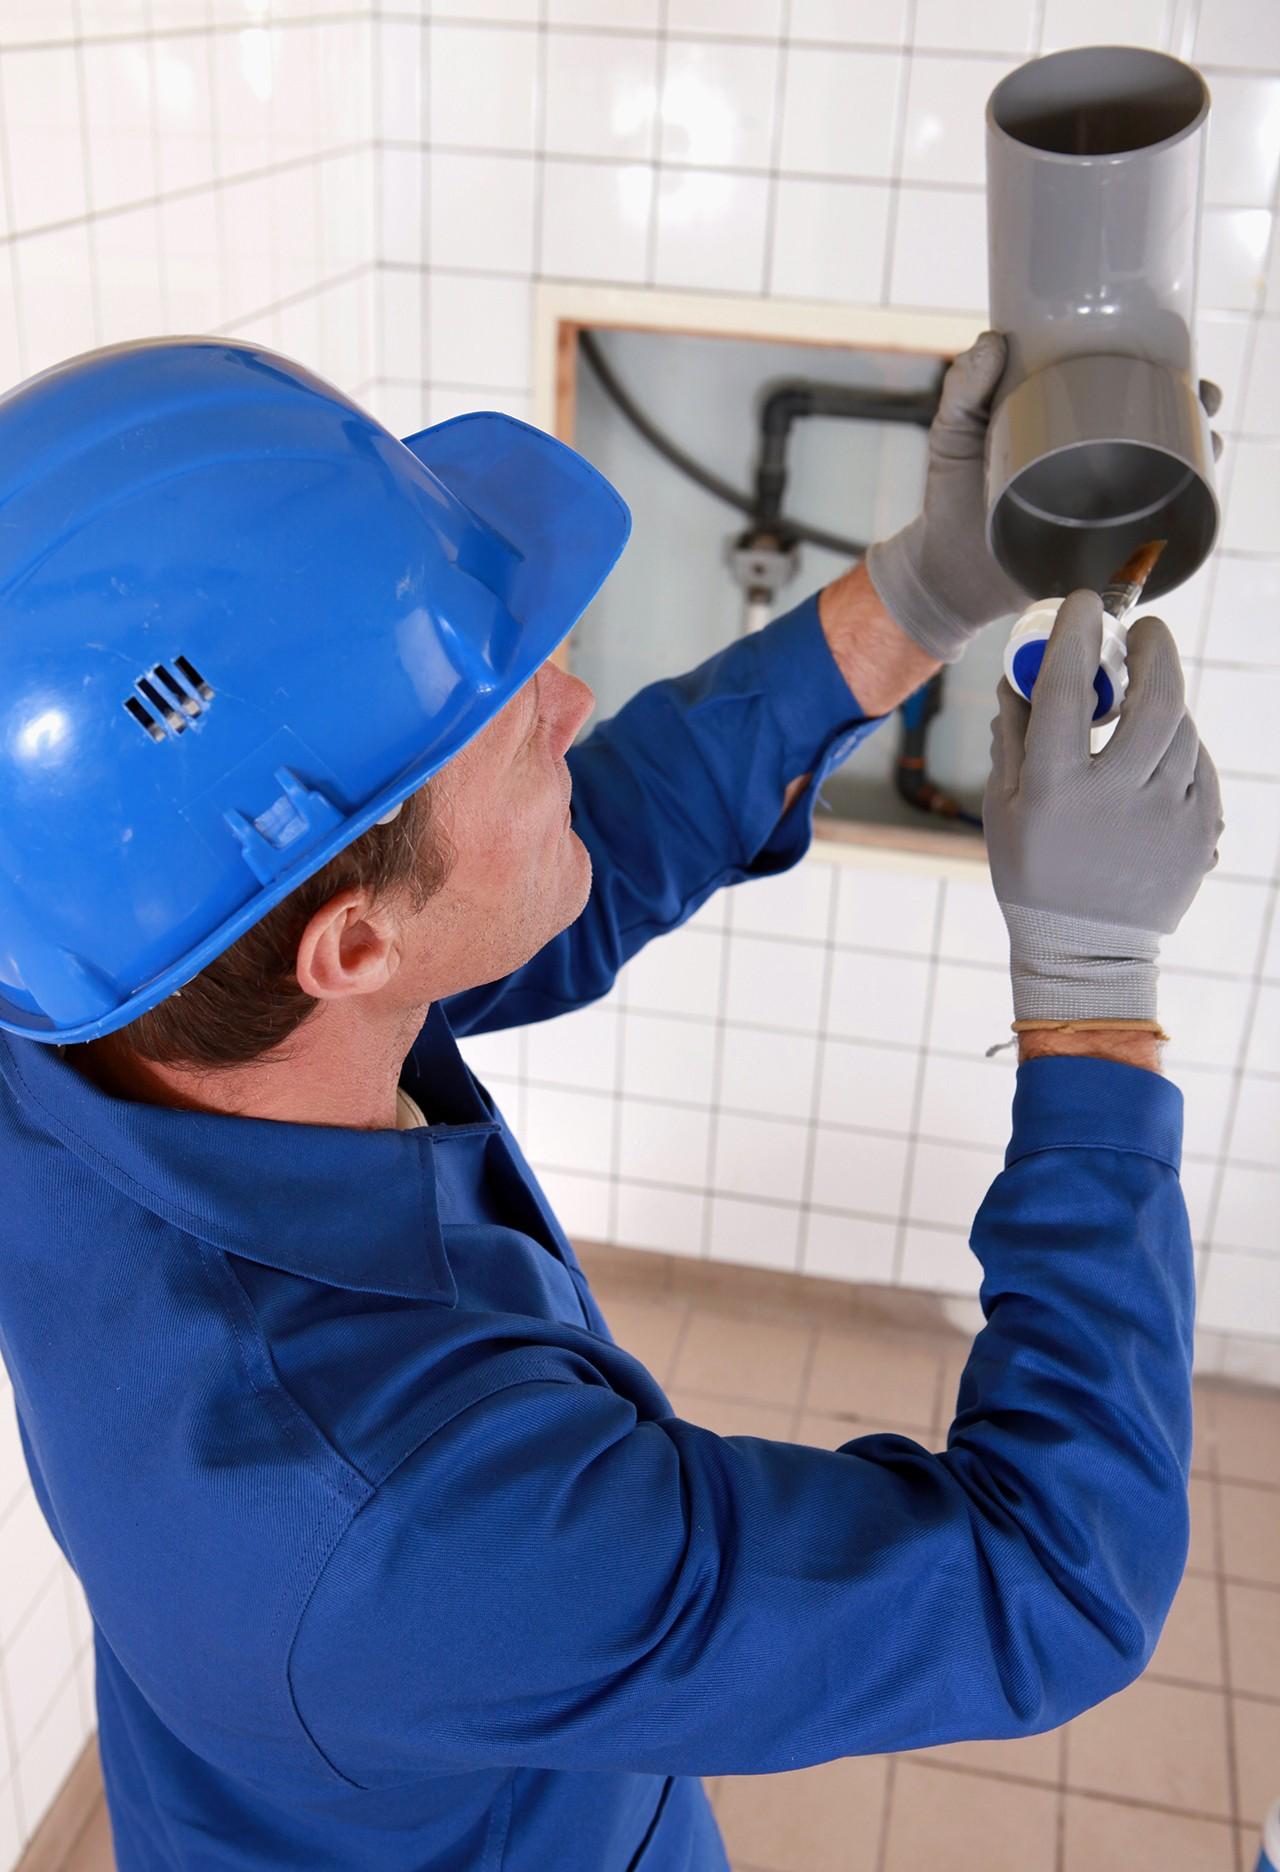 A man gluing metal